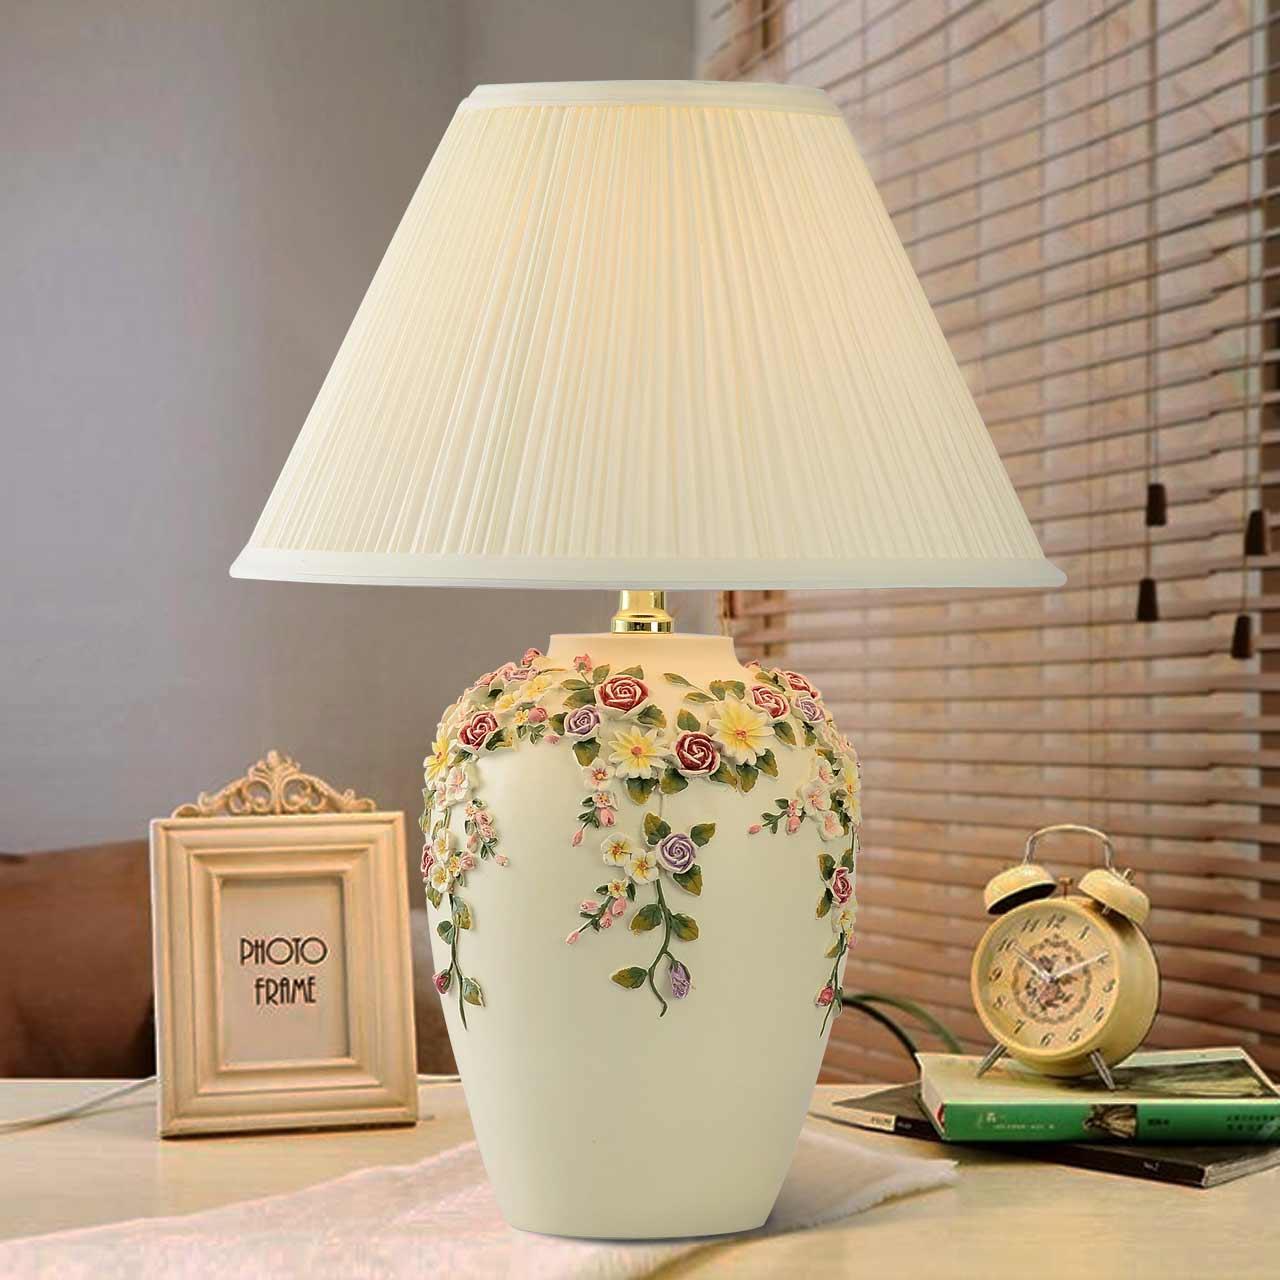 Modern Pastoral Hand Carved Resin Flowers Table Lamp For Living Room Bedroom Wedding Romantic Desk Light Ac 80 265v 1077 in LED Table Lamps from Lights Lighting